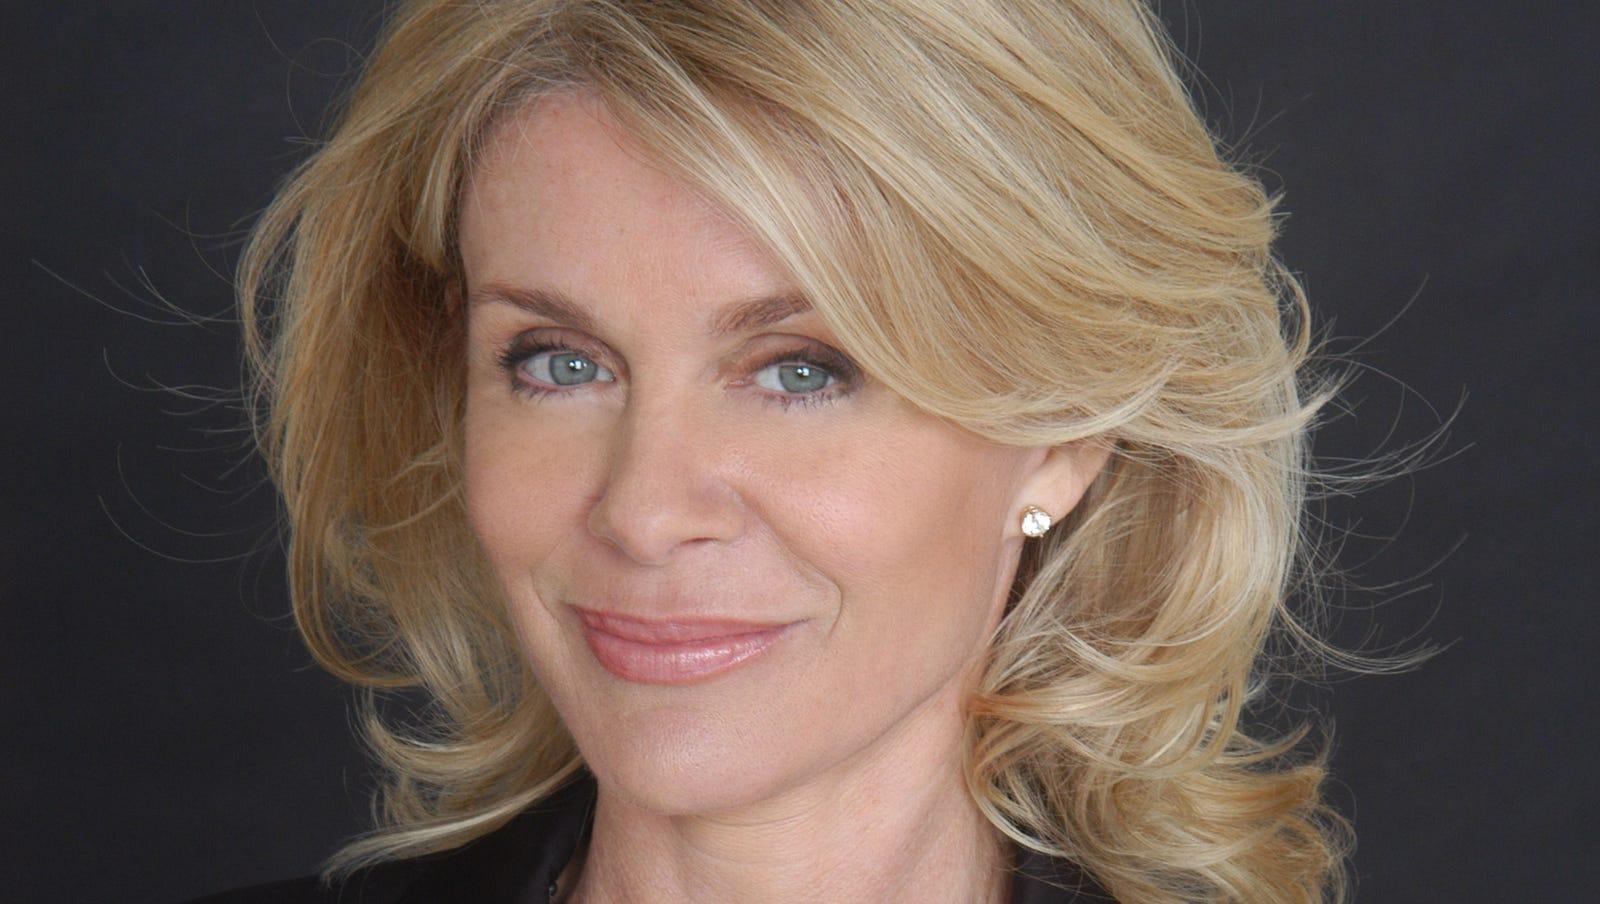 Film industry leader, entrepreneur and philanthropist Denise DuBarry Hay dies of rare malady